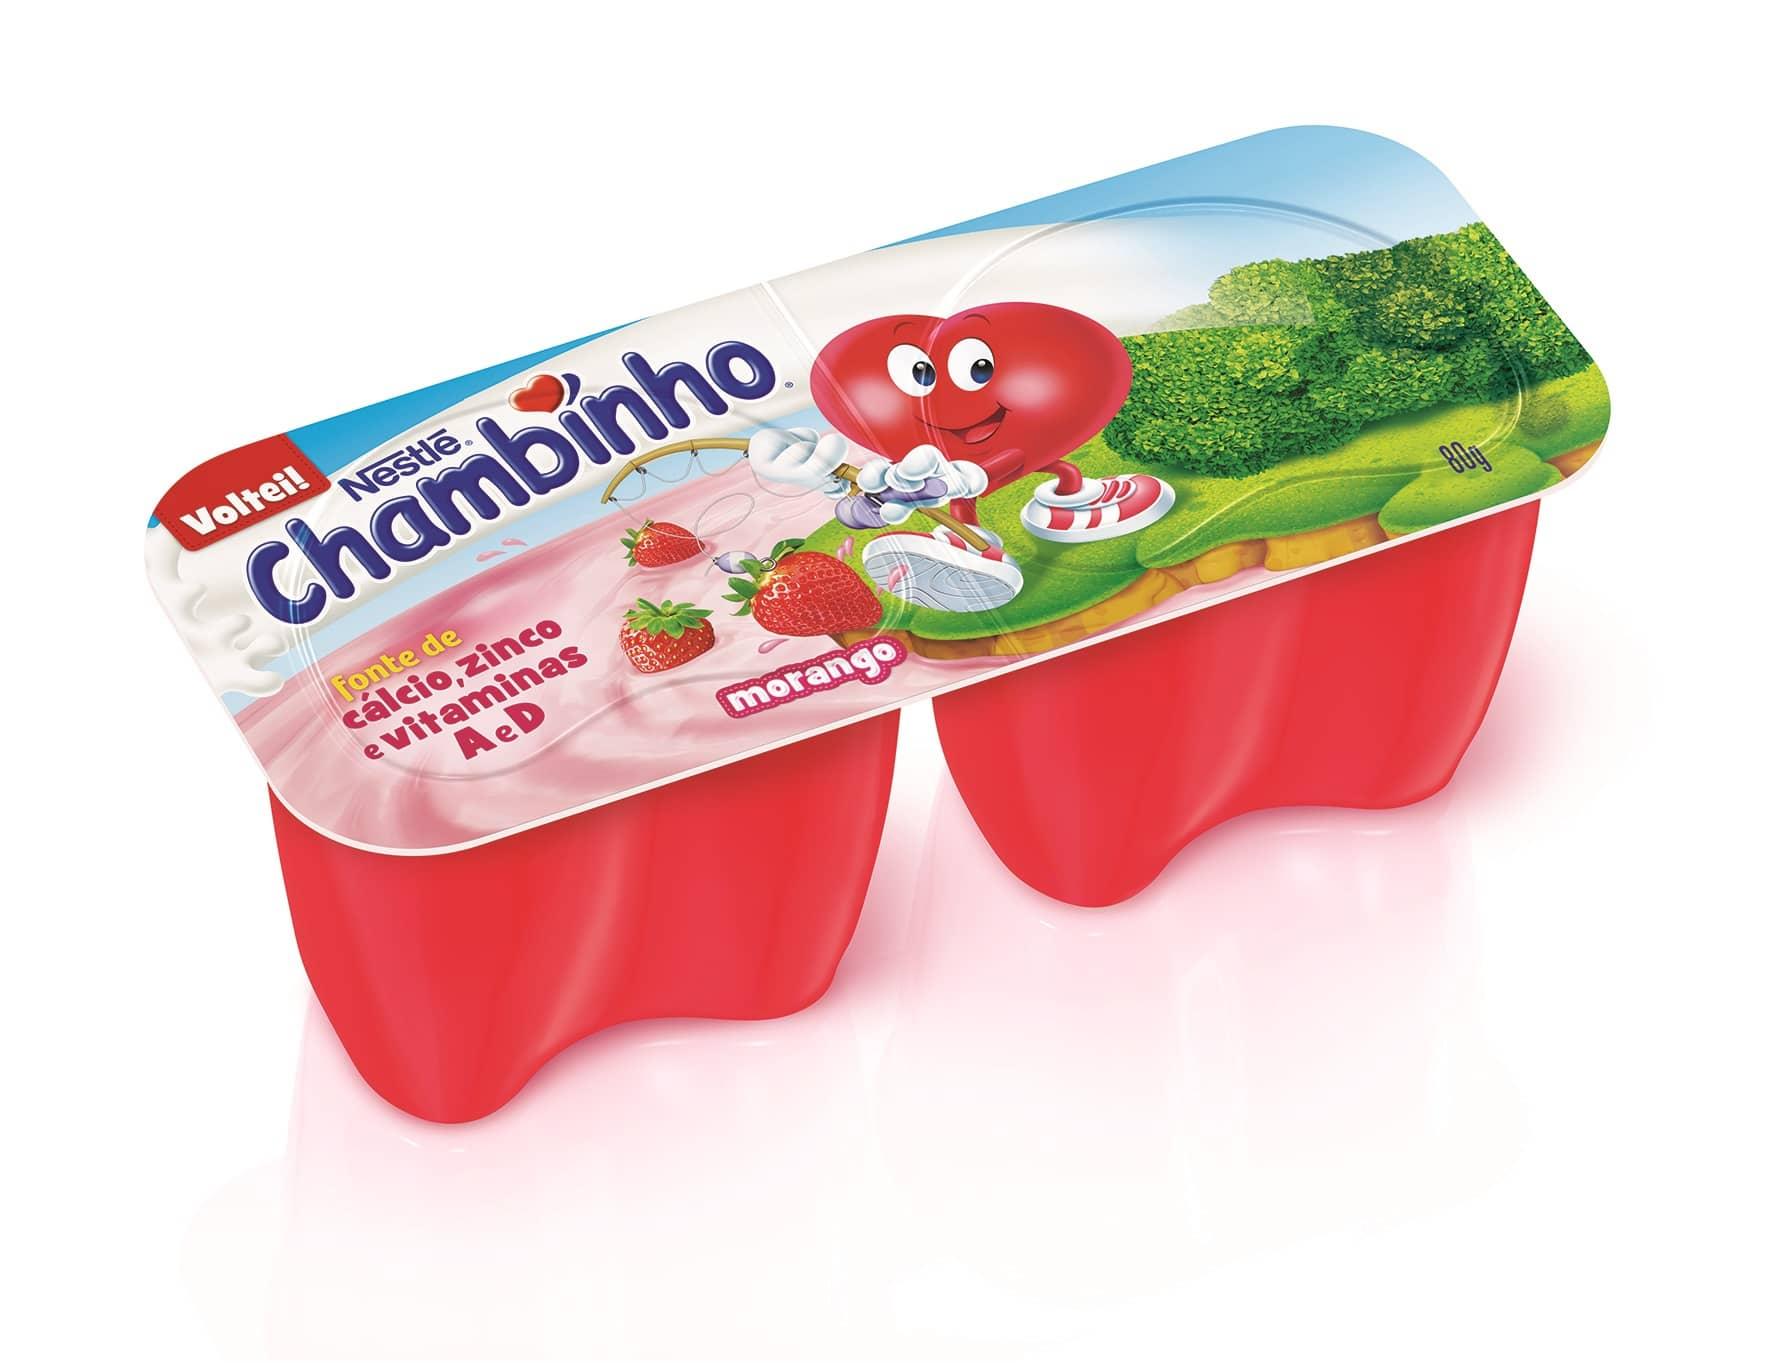 chambinho-morango-band-80g-MD-1-20140416045408081